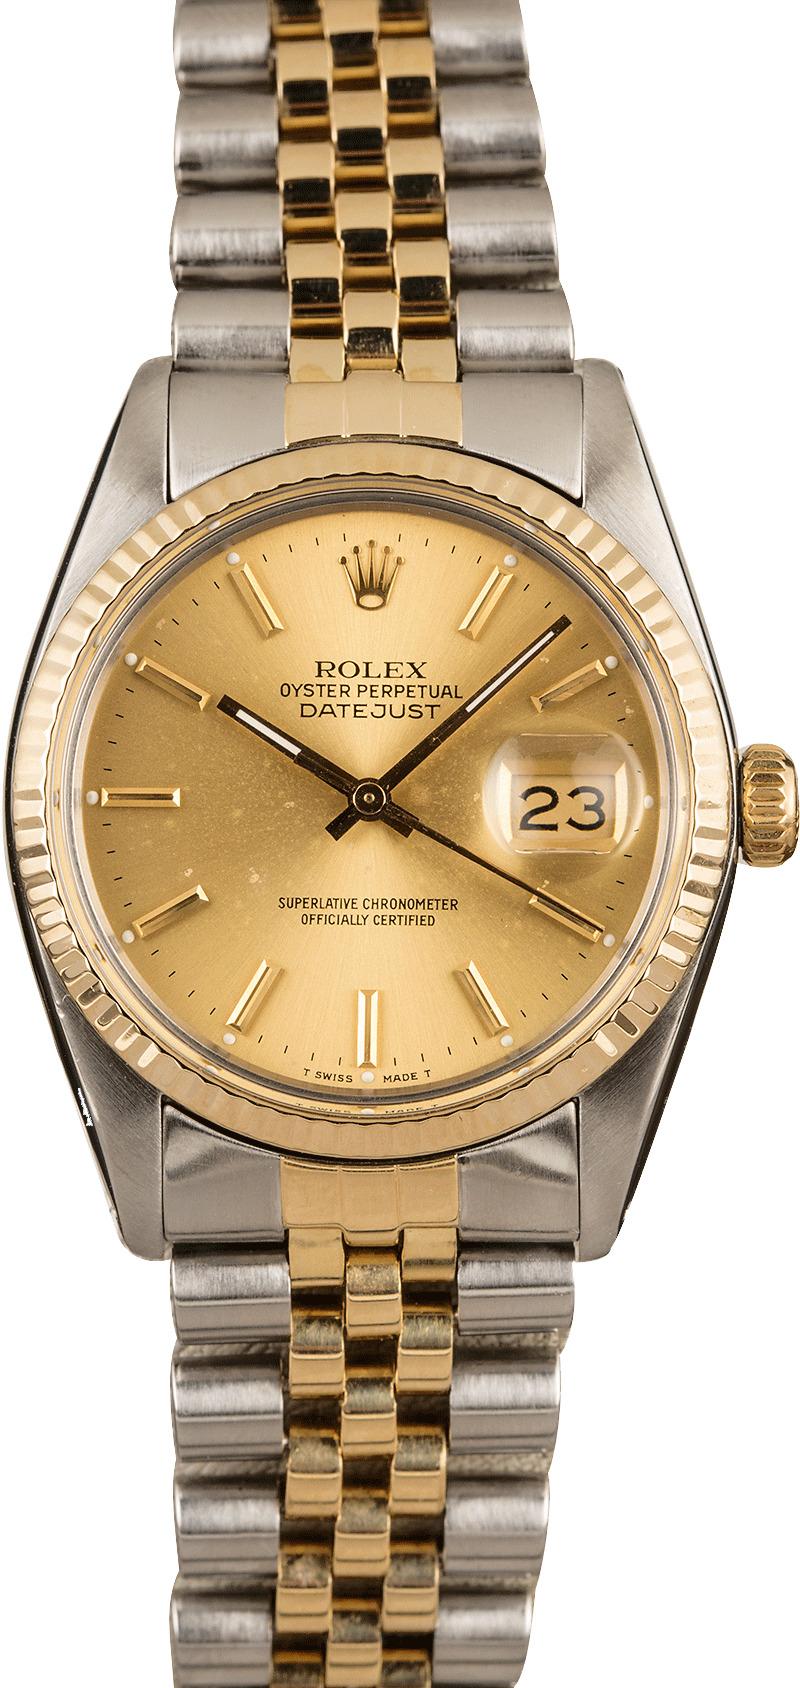 Buy Used Rolex Datejust 16013 | Bob's Watches - Sku: 129562